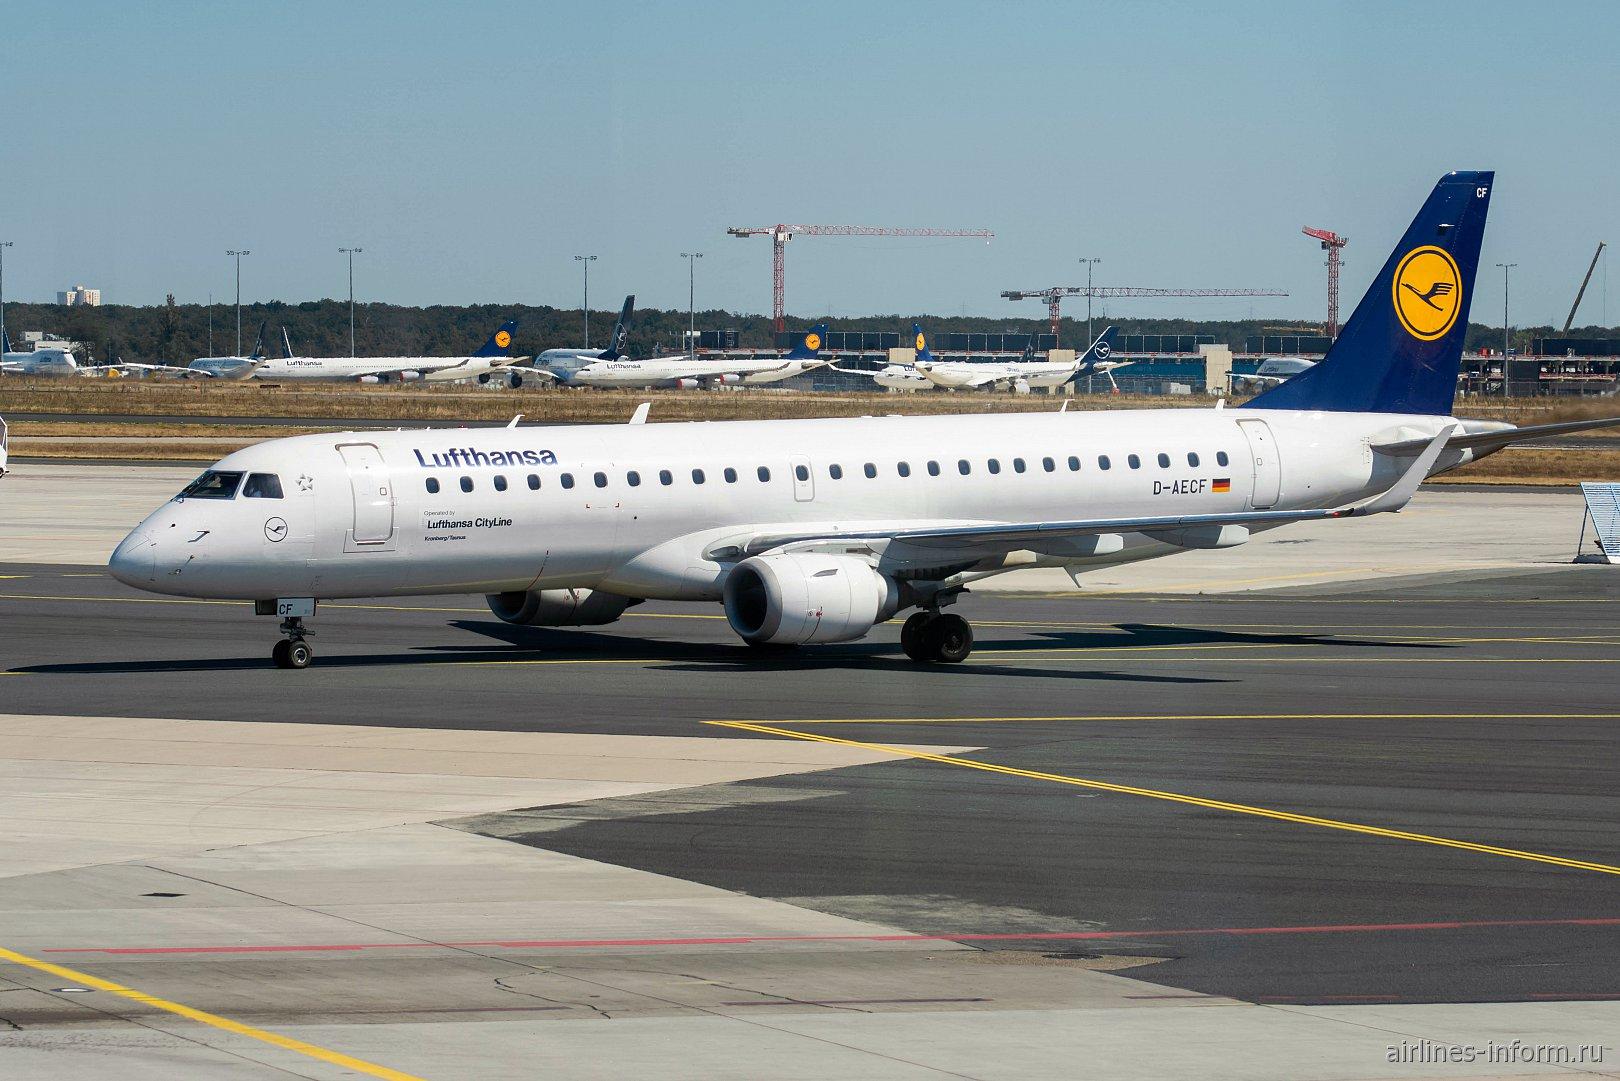 Самолет Эмбраер-190 авиакомпании Lufthansa CityLine в аэропорту Франкфурт